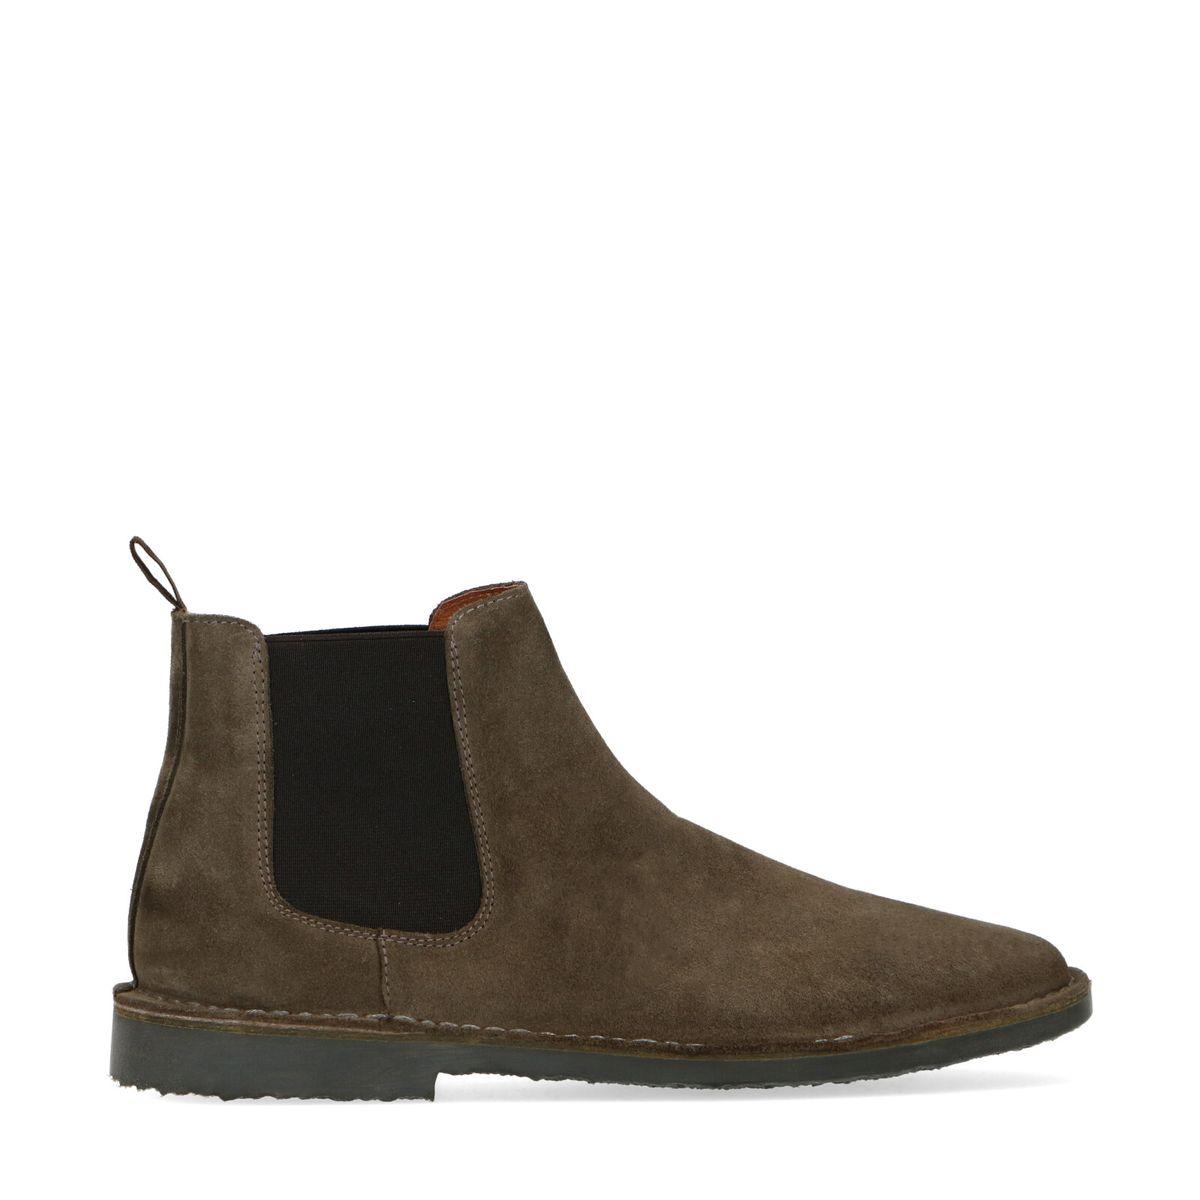 Chelsea boots en daim - kaki - Sacha - Modalova